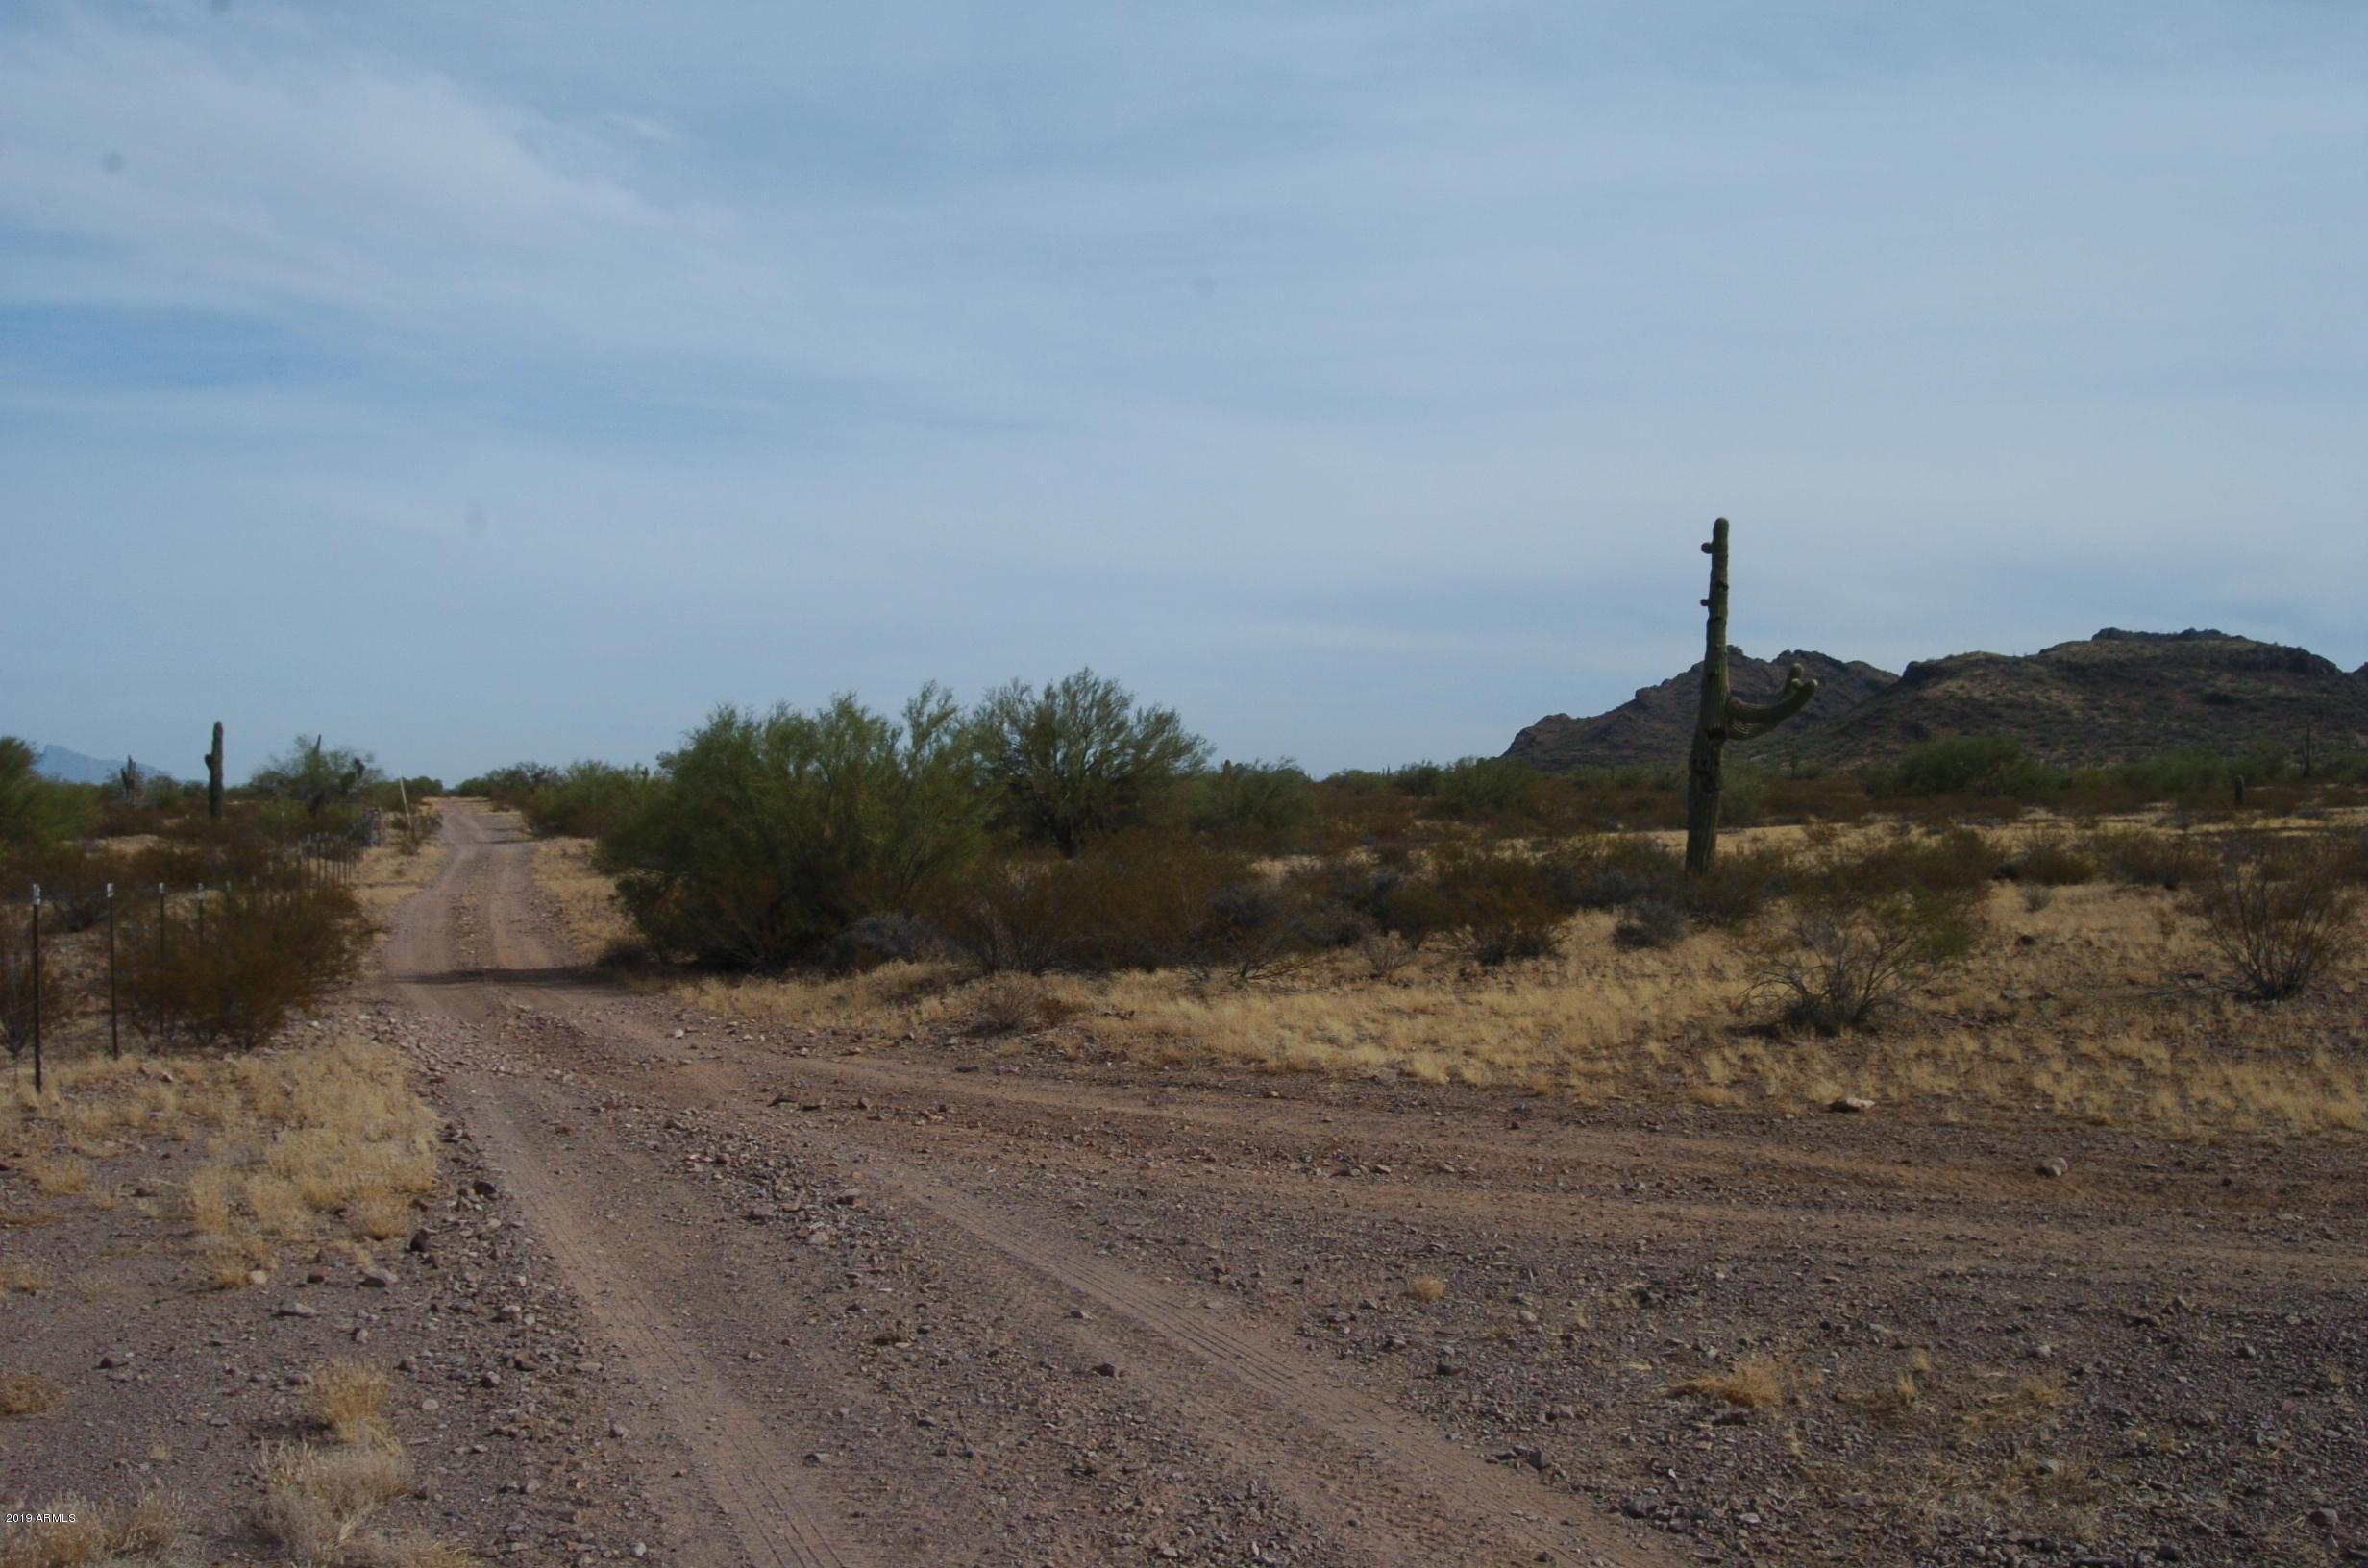 000 W Harmon Road, Eloy, Arizona 85131, ,Land,For Sale,000 W Harmon Road,6005439